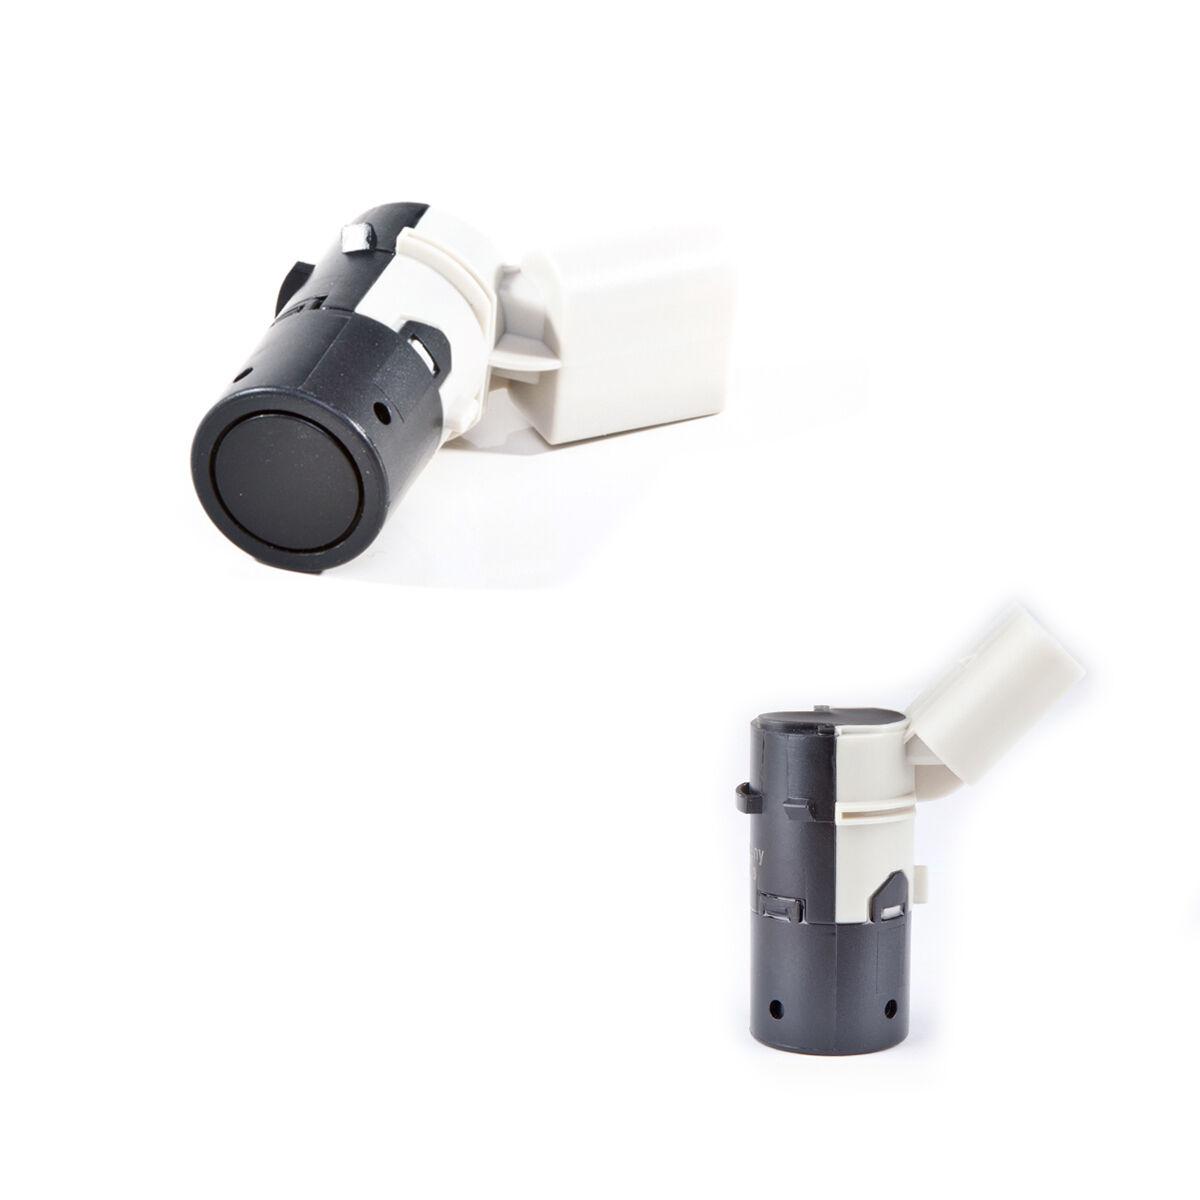 Sensor Radar Rückfahr Detektor Hilfe Zum Parken 7H0919275C 7H0 919 275 C